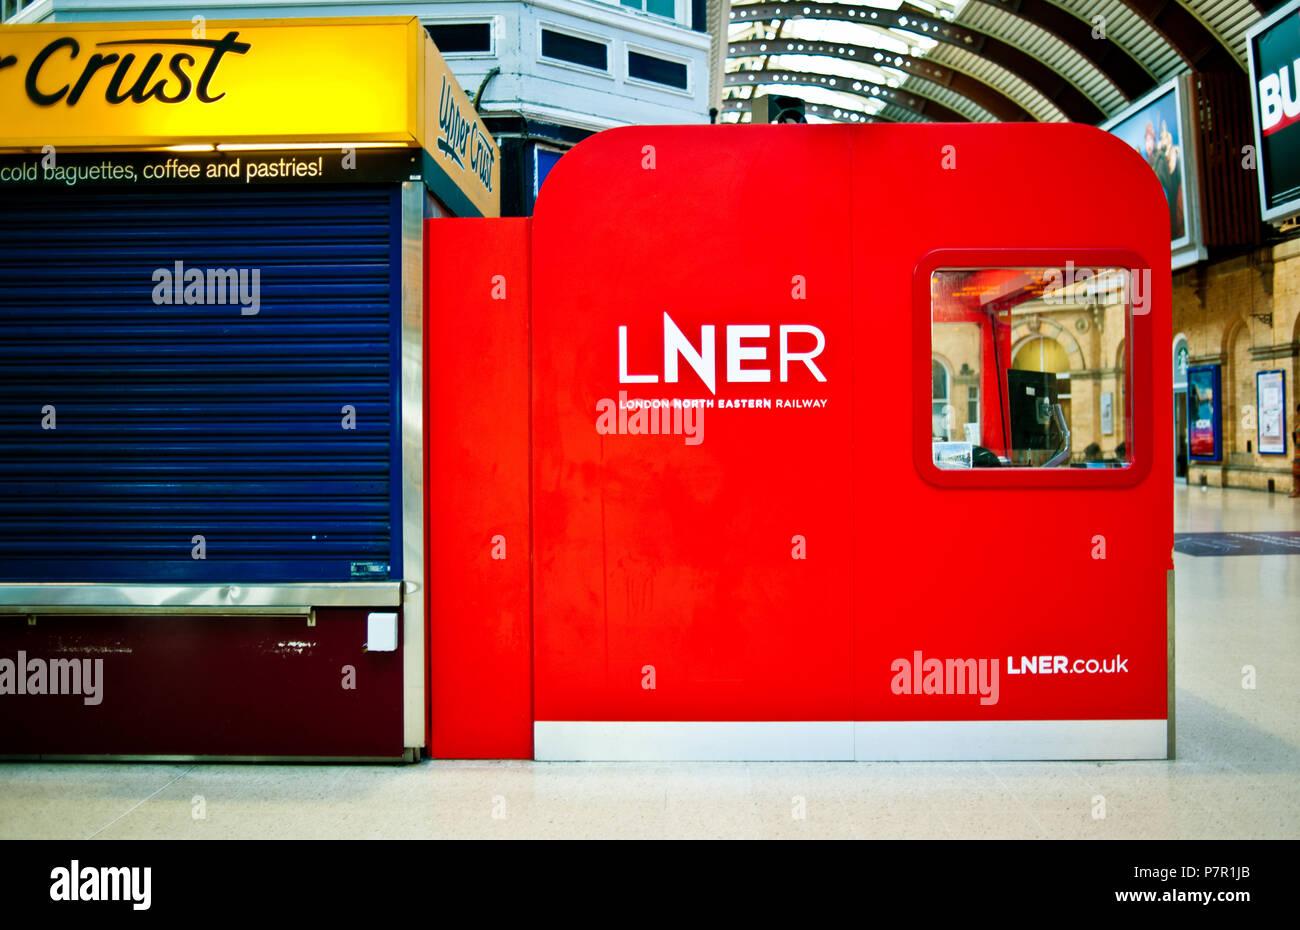 LNER ( London North Eastern railway ) branding, York Railway Station, York, England - Stock Image